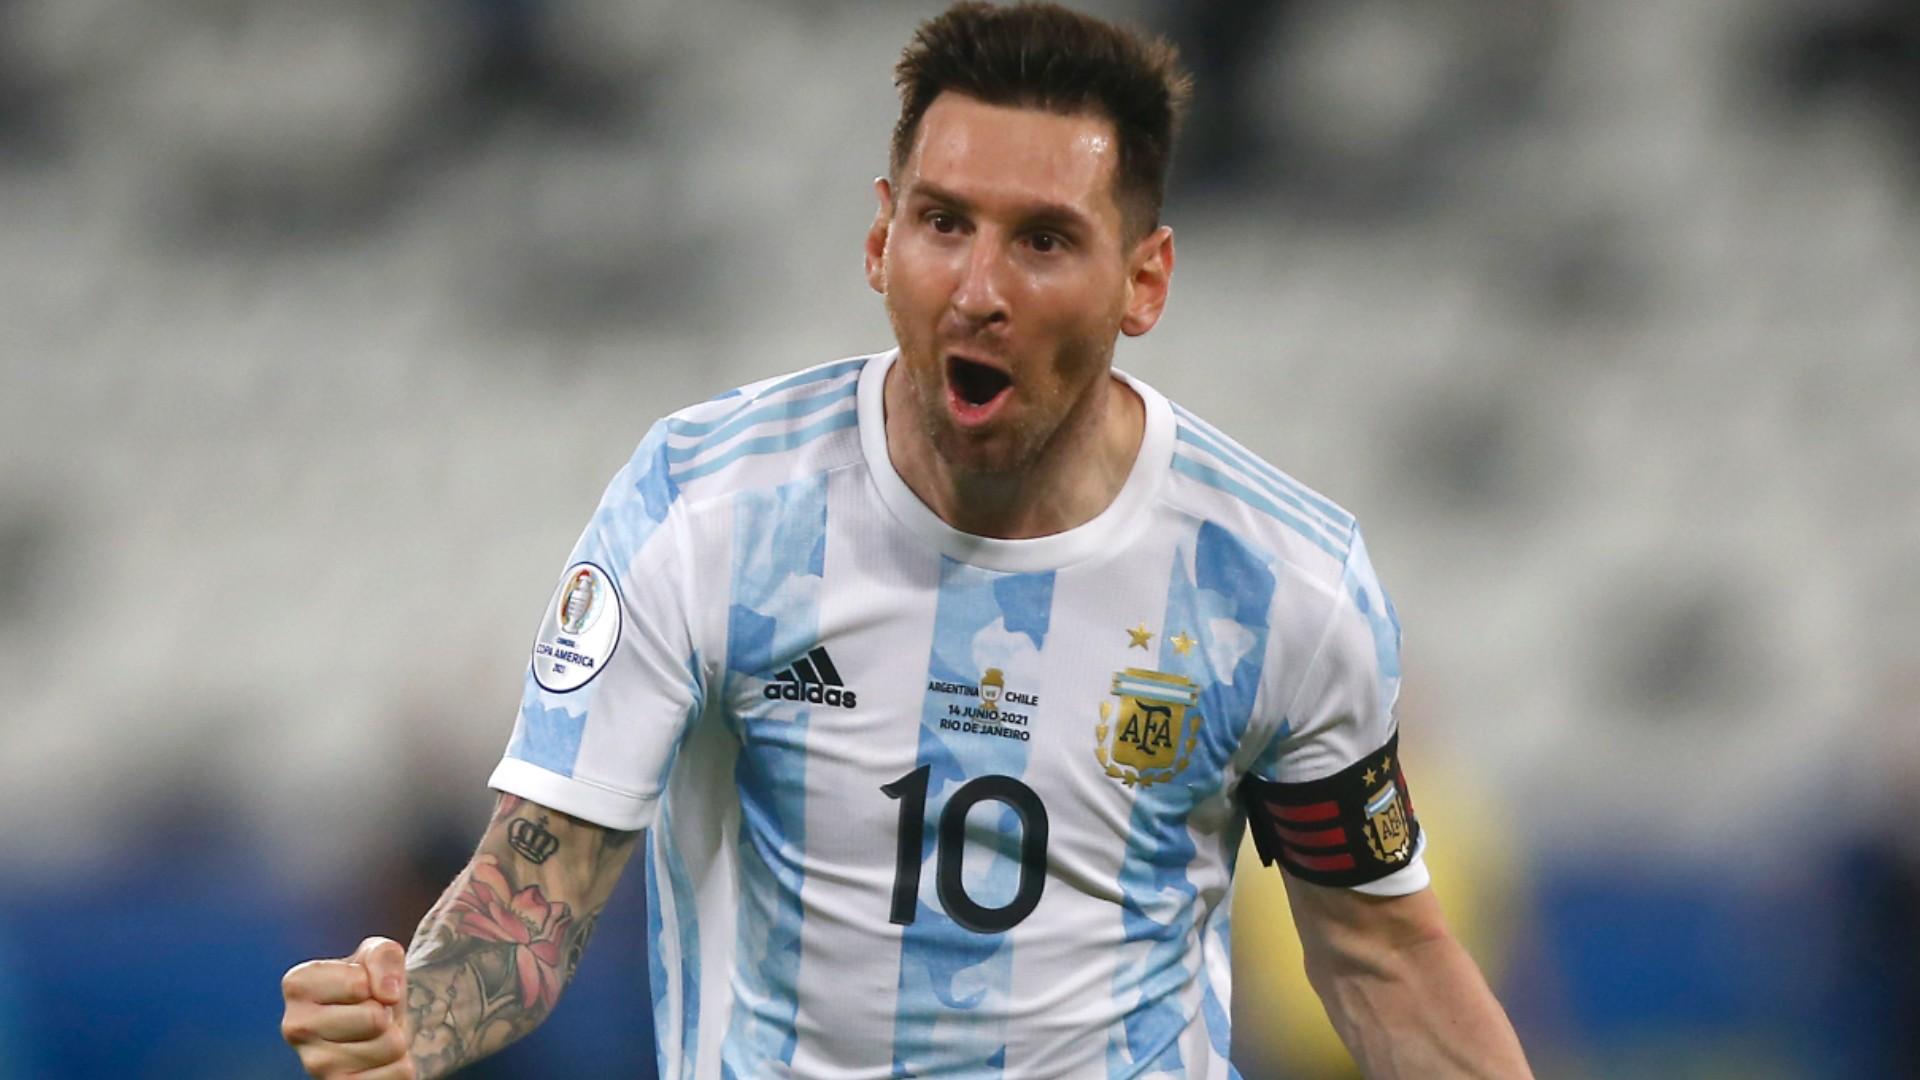 Lionel Messi scores sick free kick goal in 2021 Copa America debut